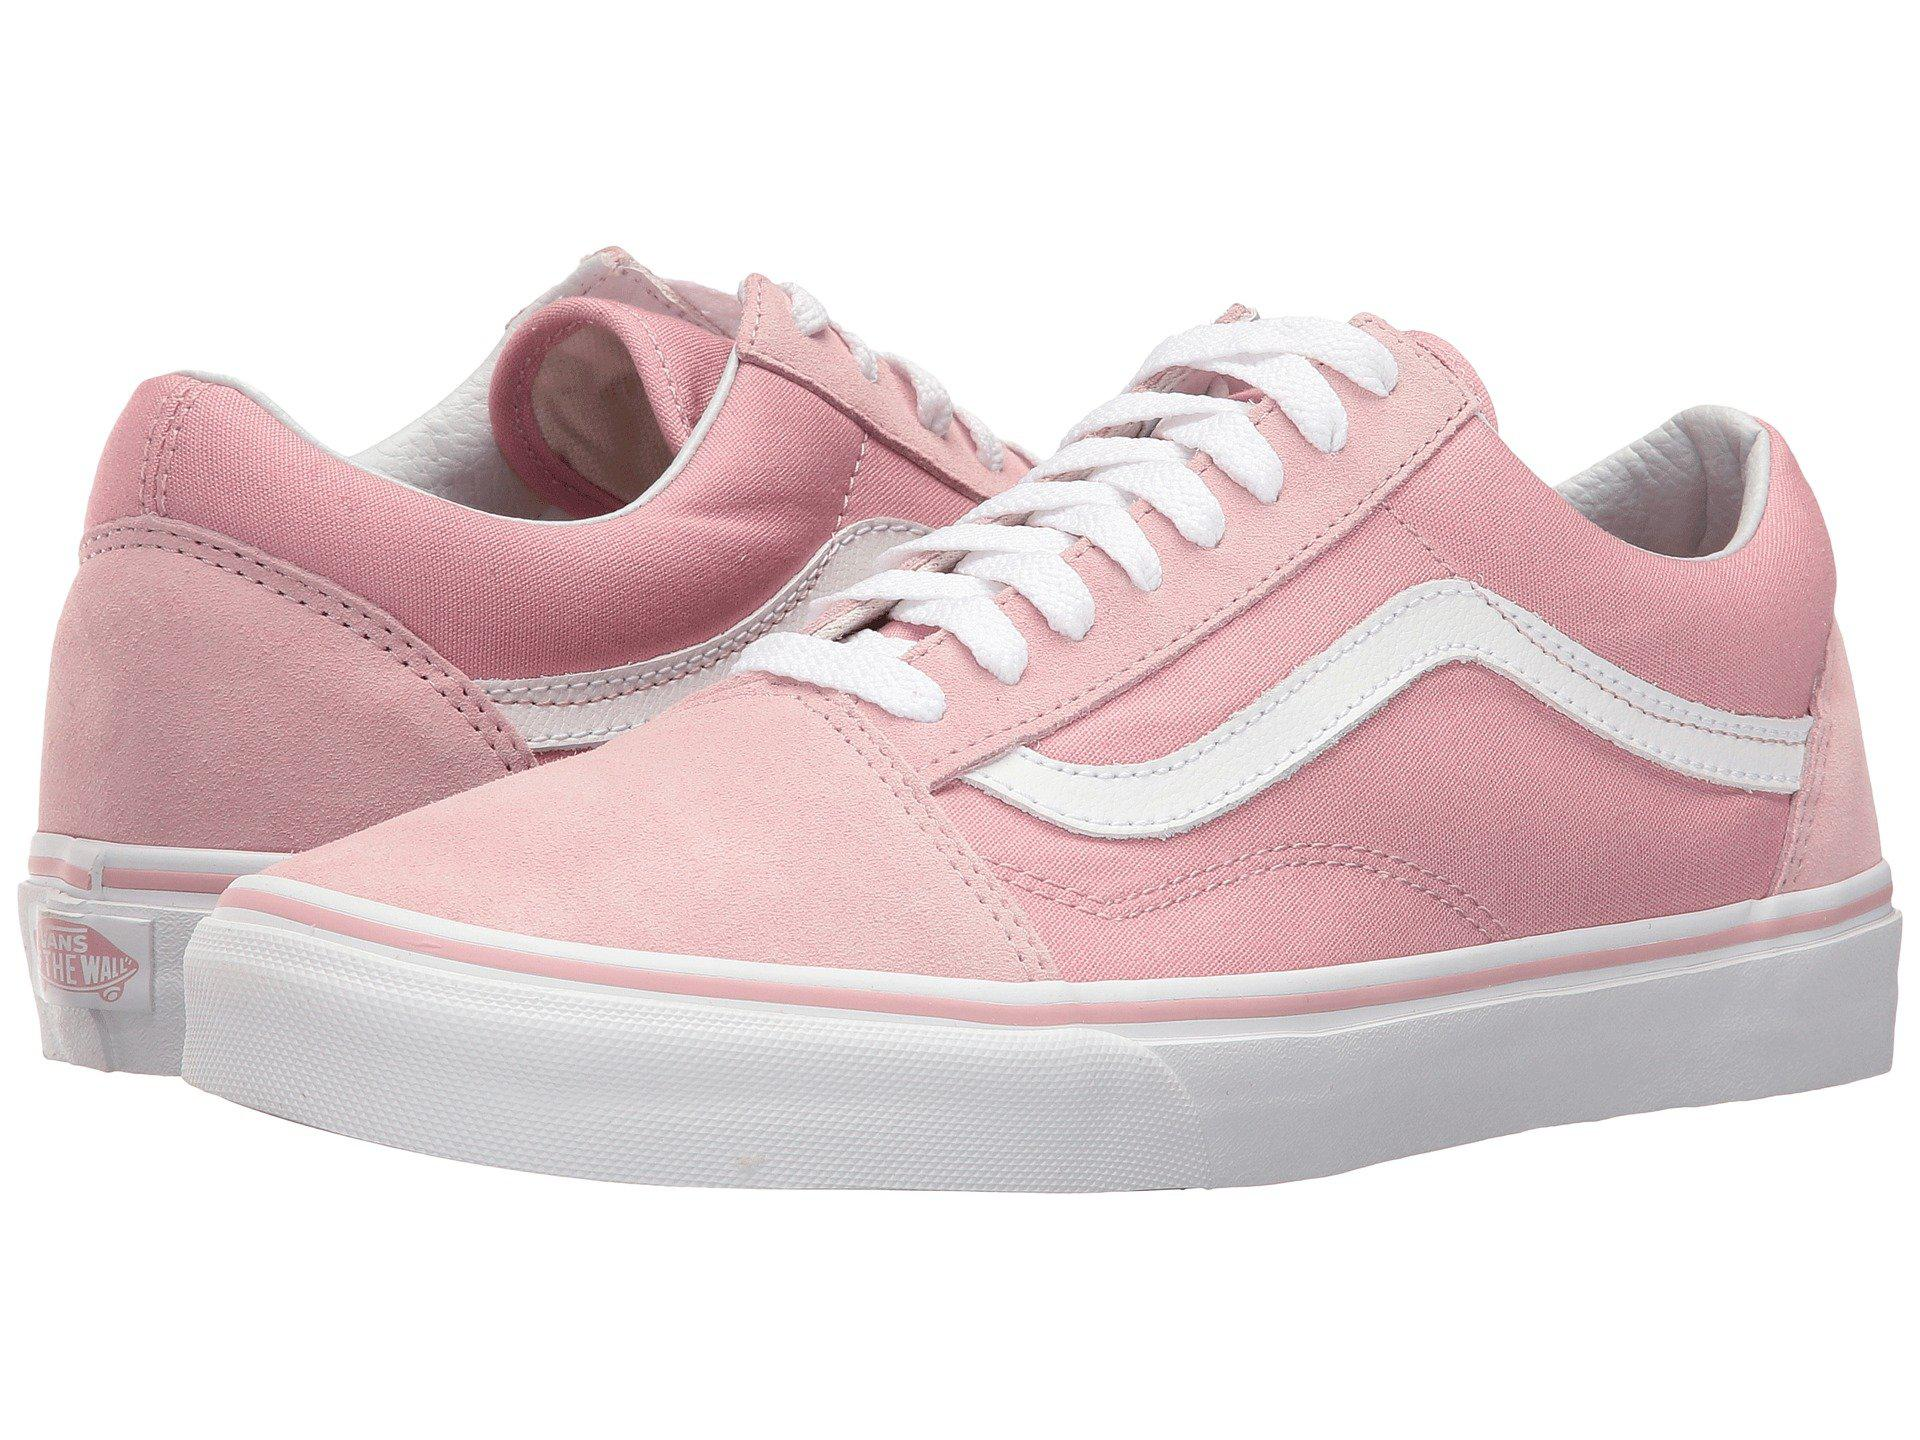 81e69977e007 Vans. Women s Old Skooltm ((pig Suede) Darkest Spruce true White) Skate  Shoes